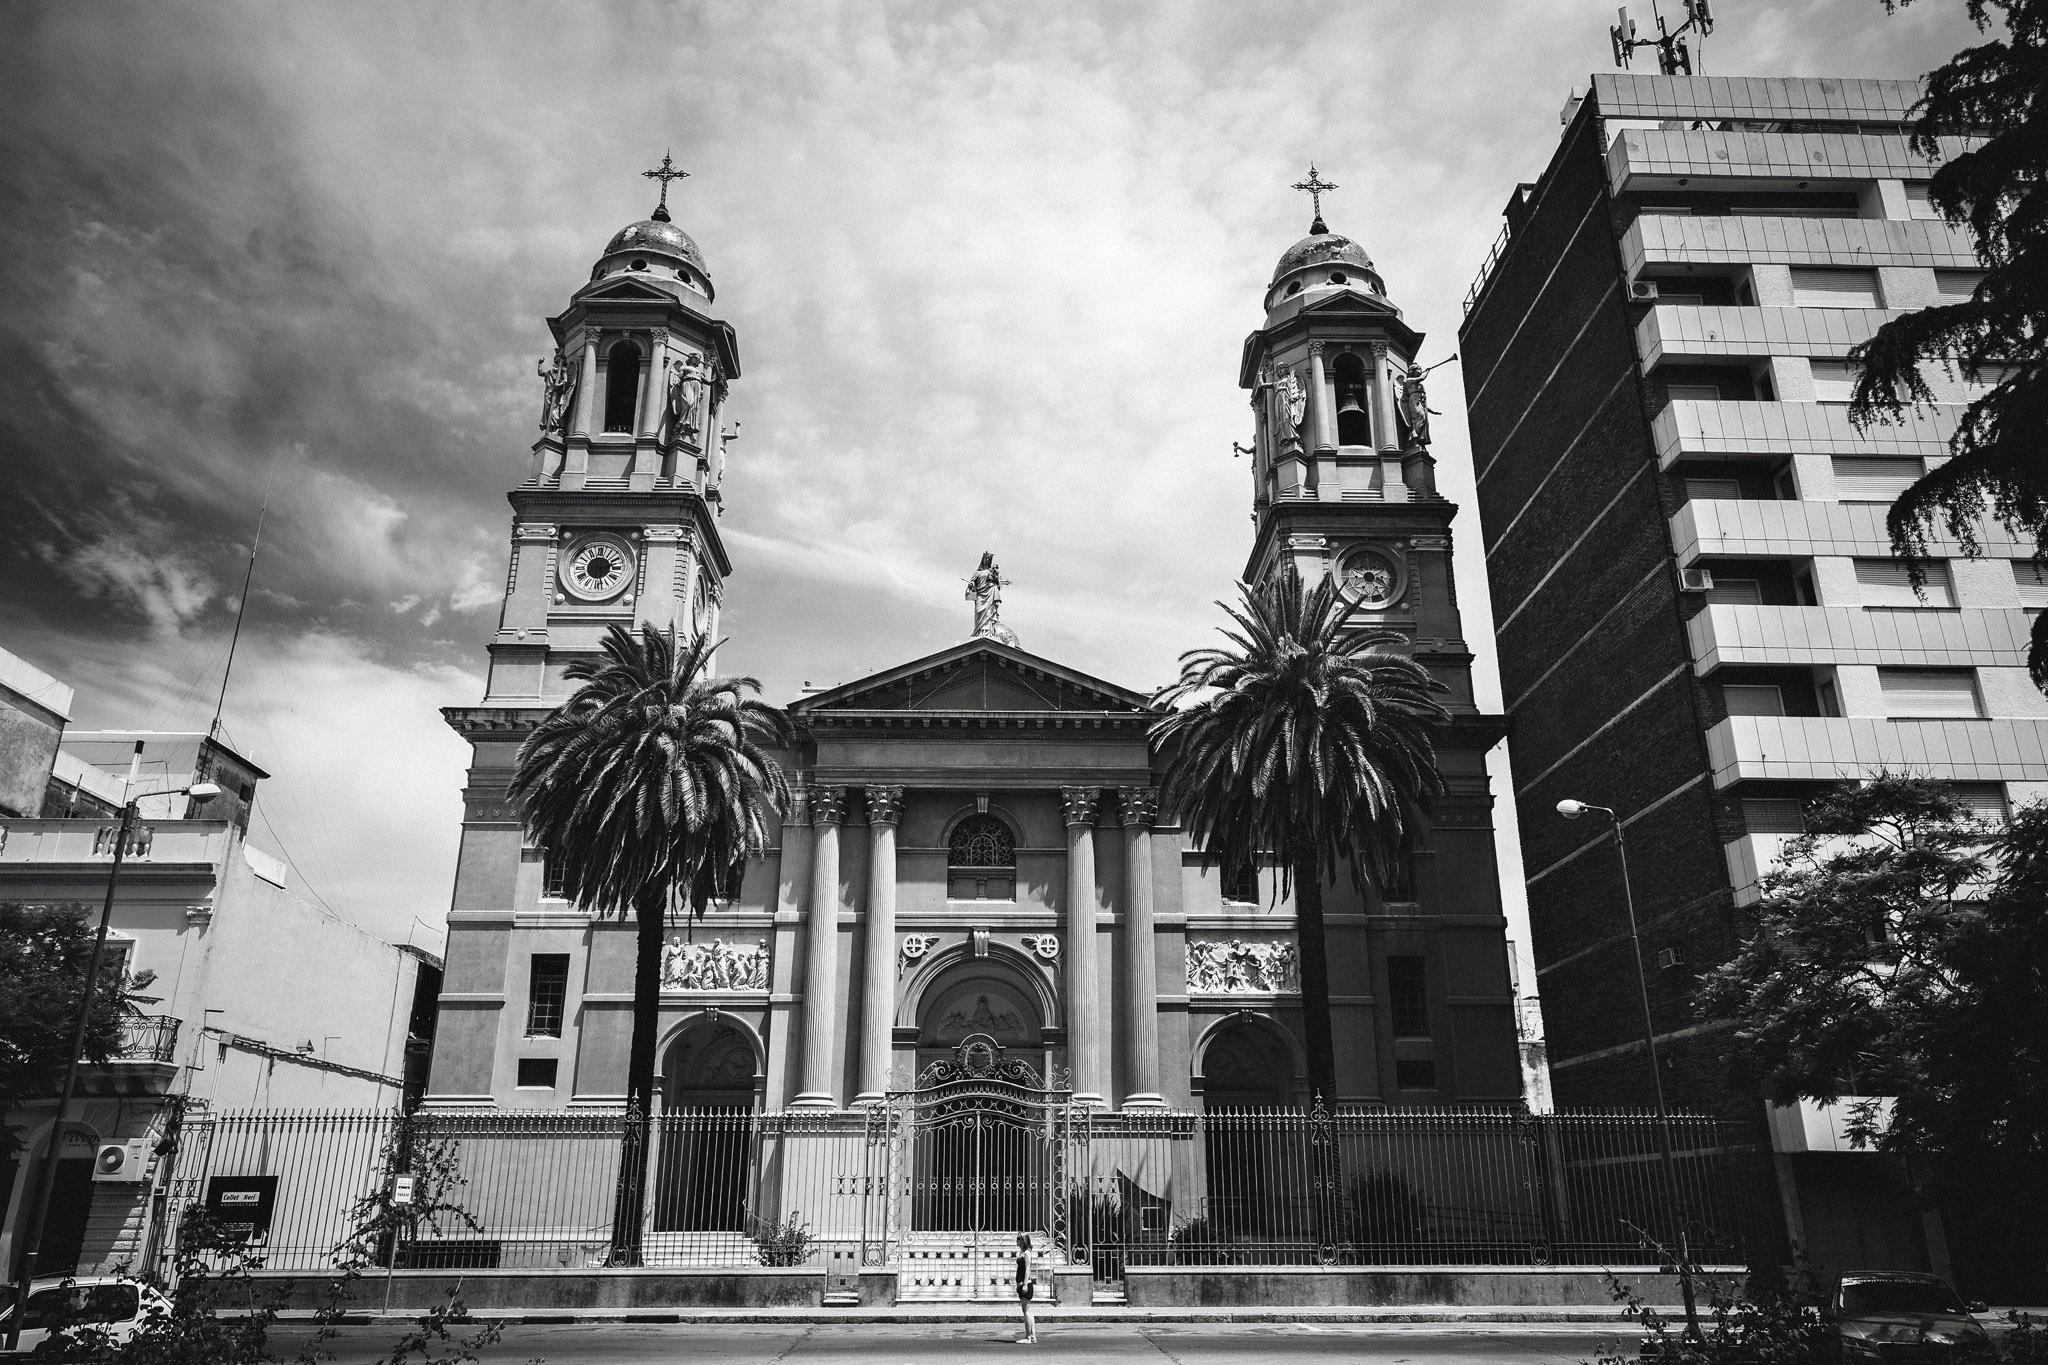 wedding-travellers-destination-photography-overlanding-south-america-uruguay-mercedes